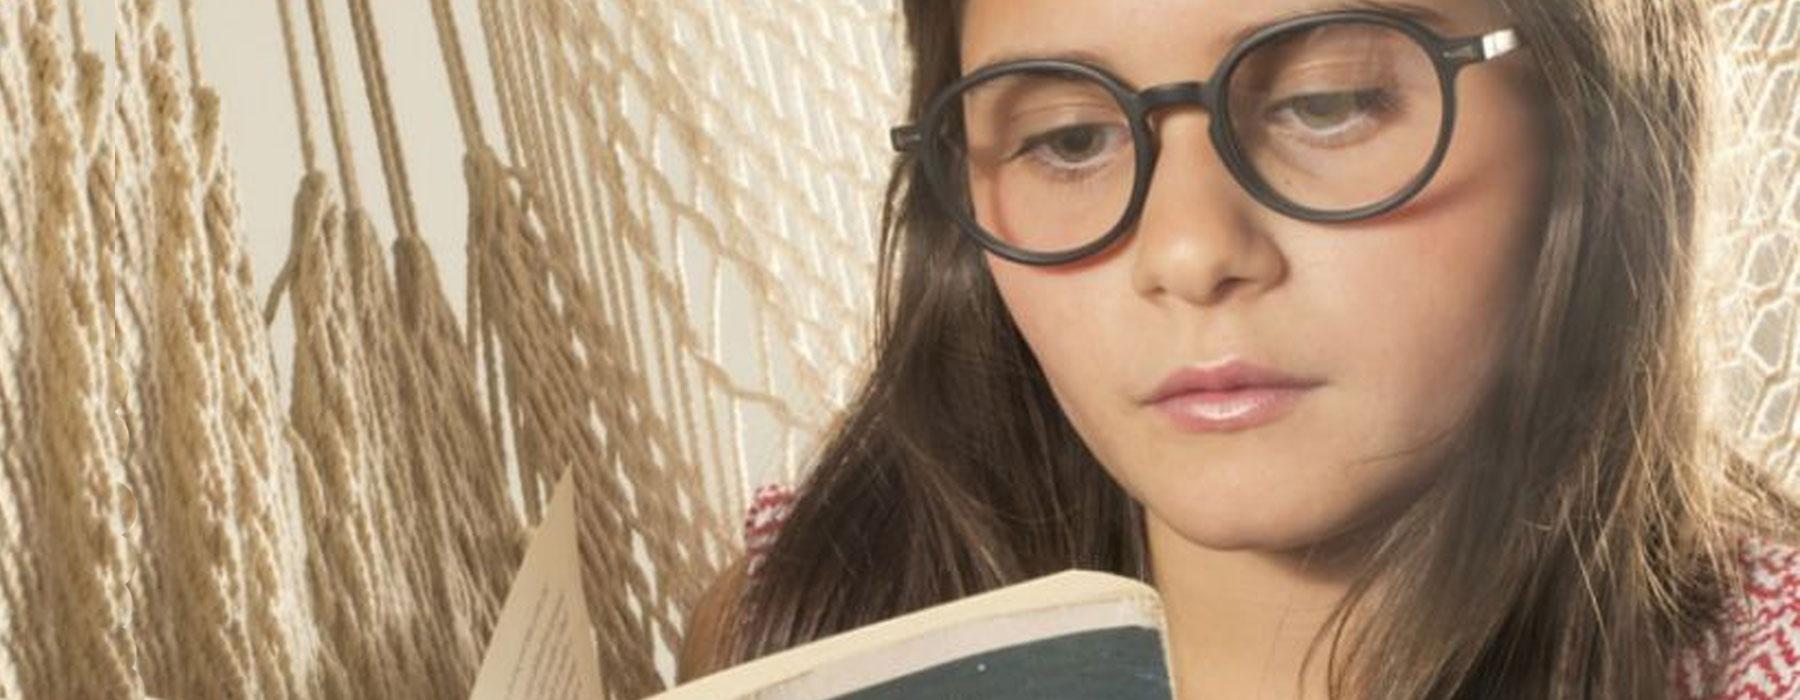 ulleres infantils andorra